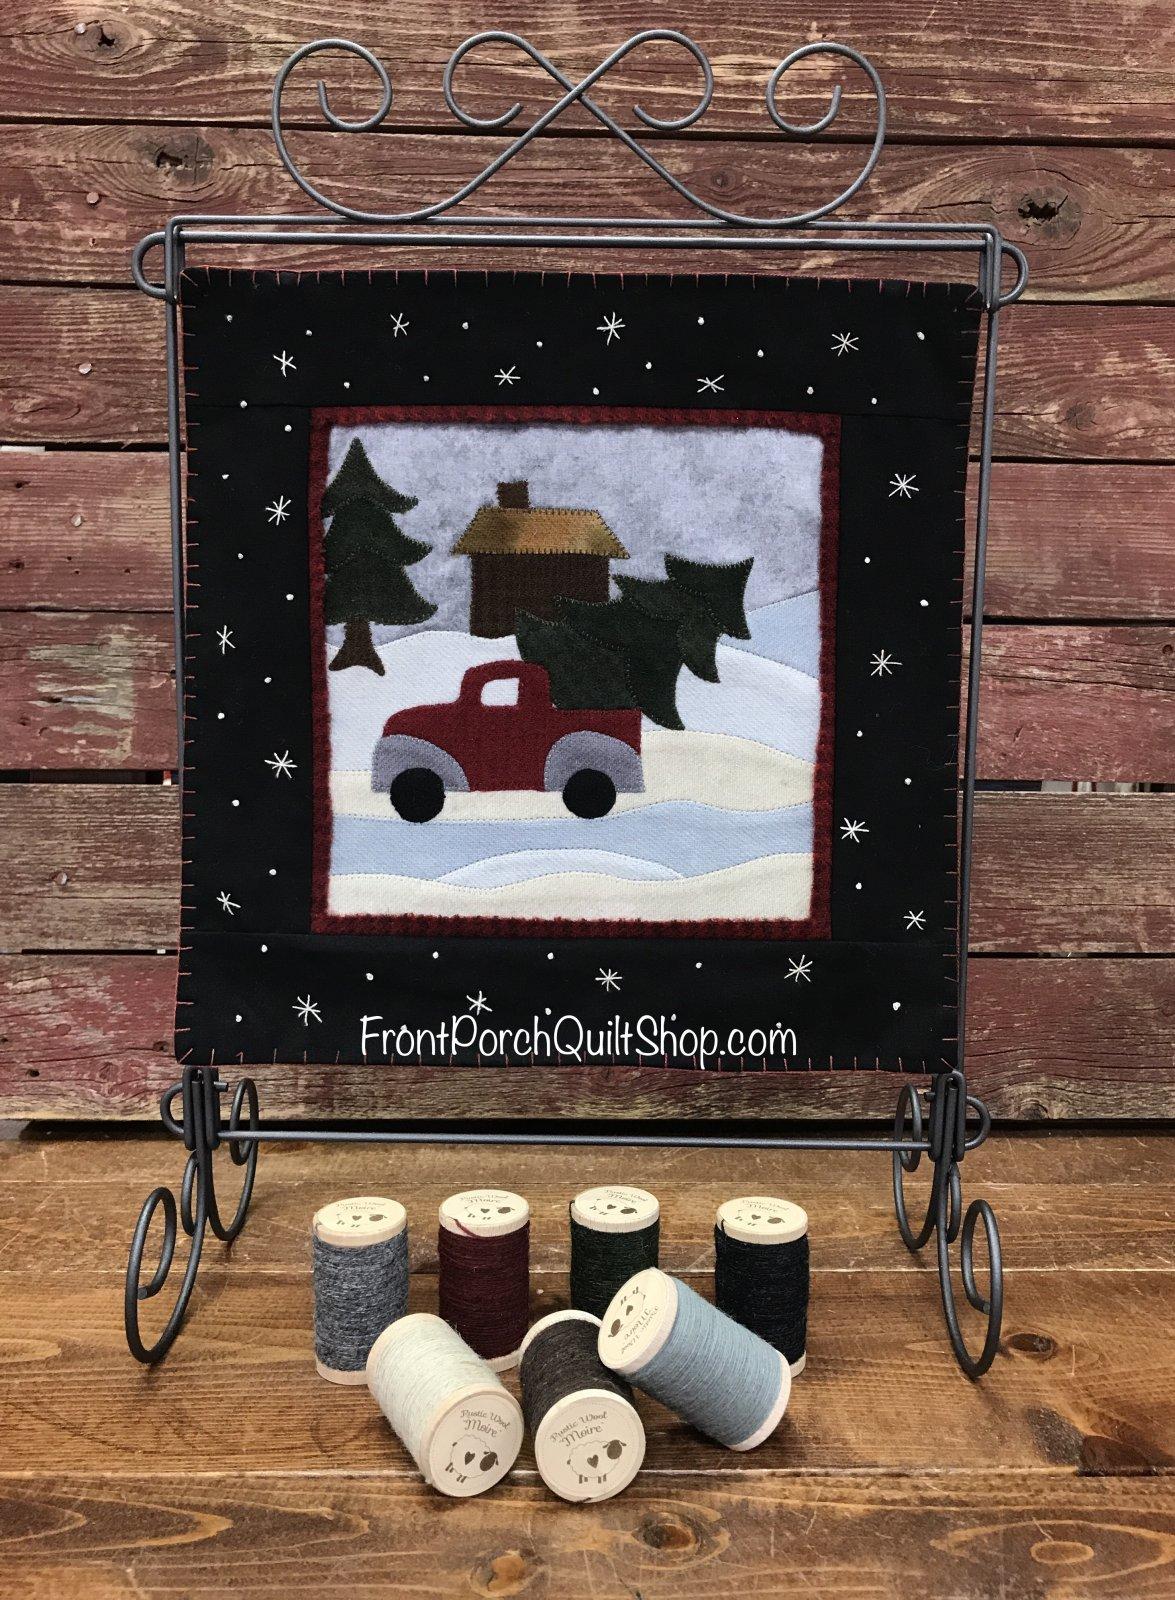 Winter Wonderland Kit